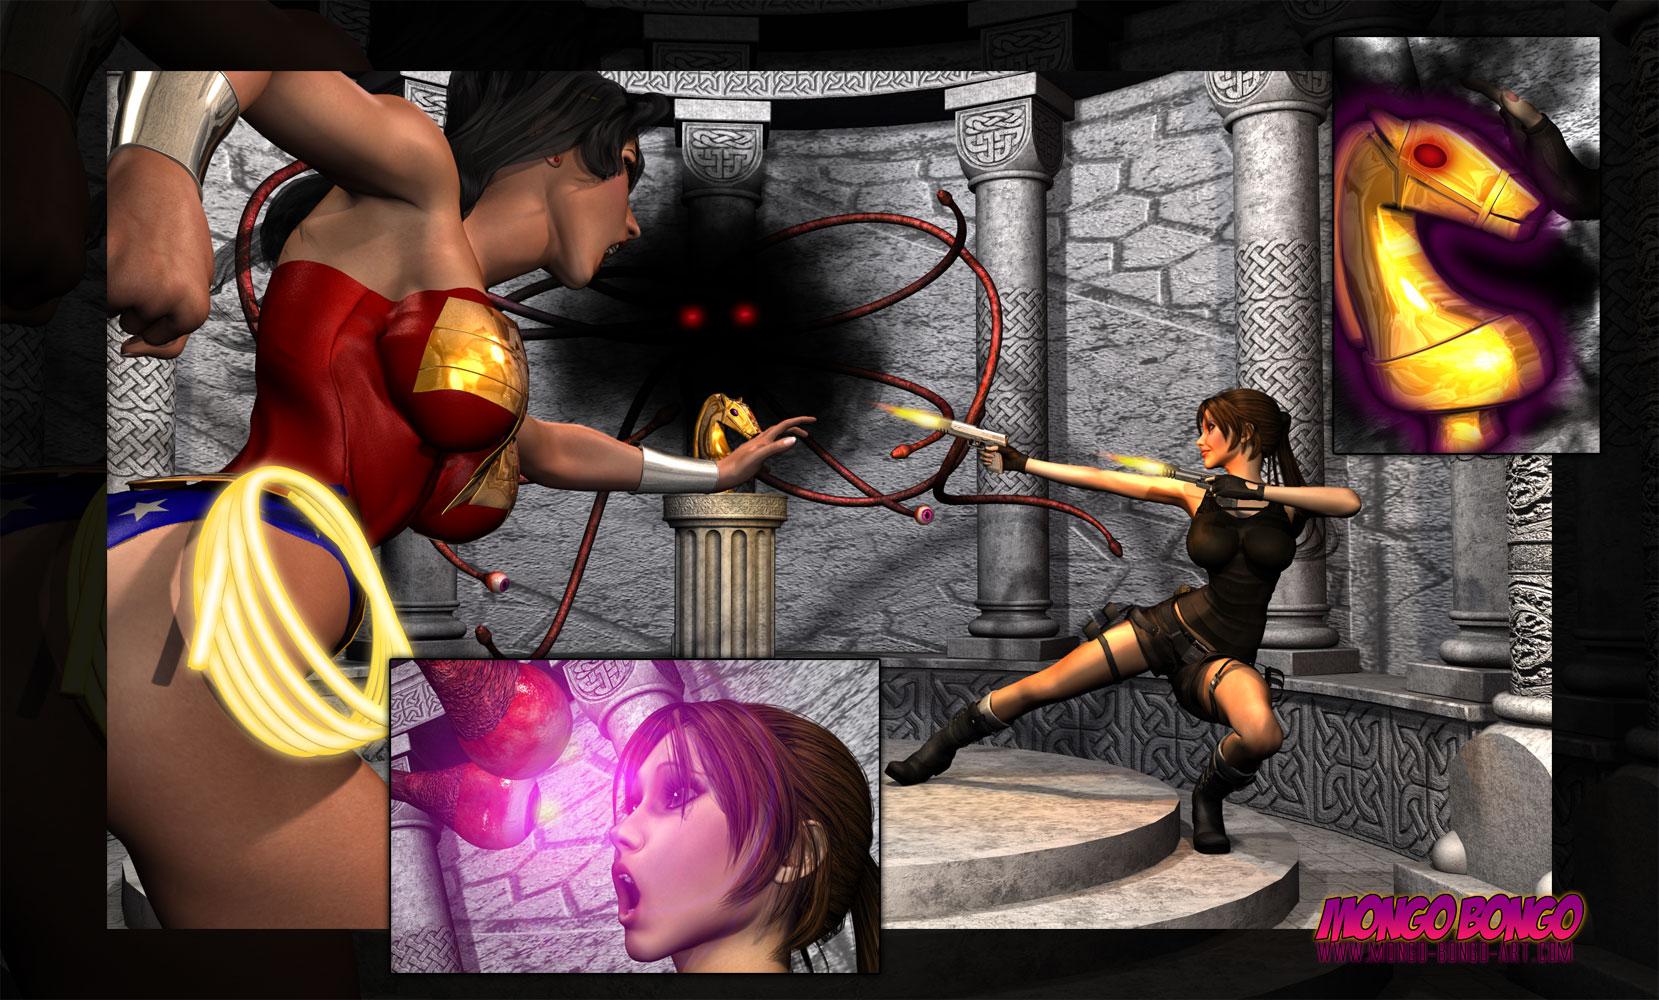 SureFap xxx porno Crossover - [Mongo Bongo][3D] - Lara Croft and Wonder Woman Vs Terrible Overlord